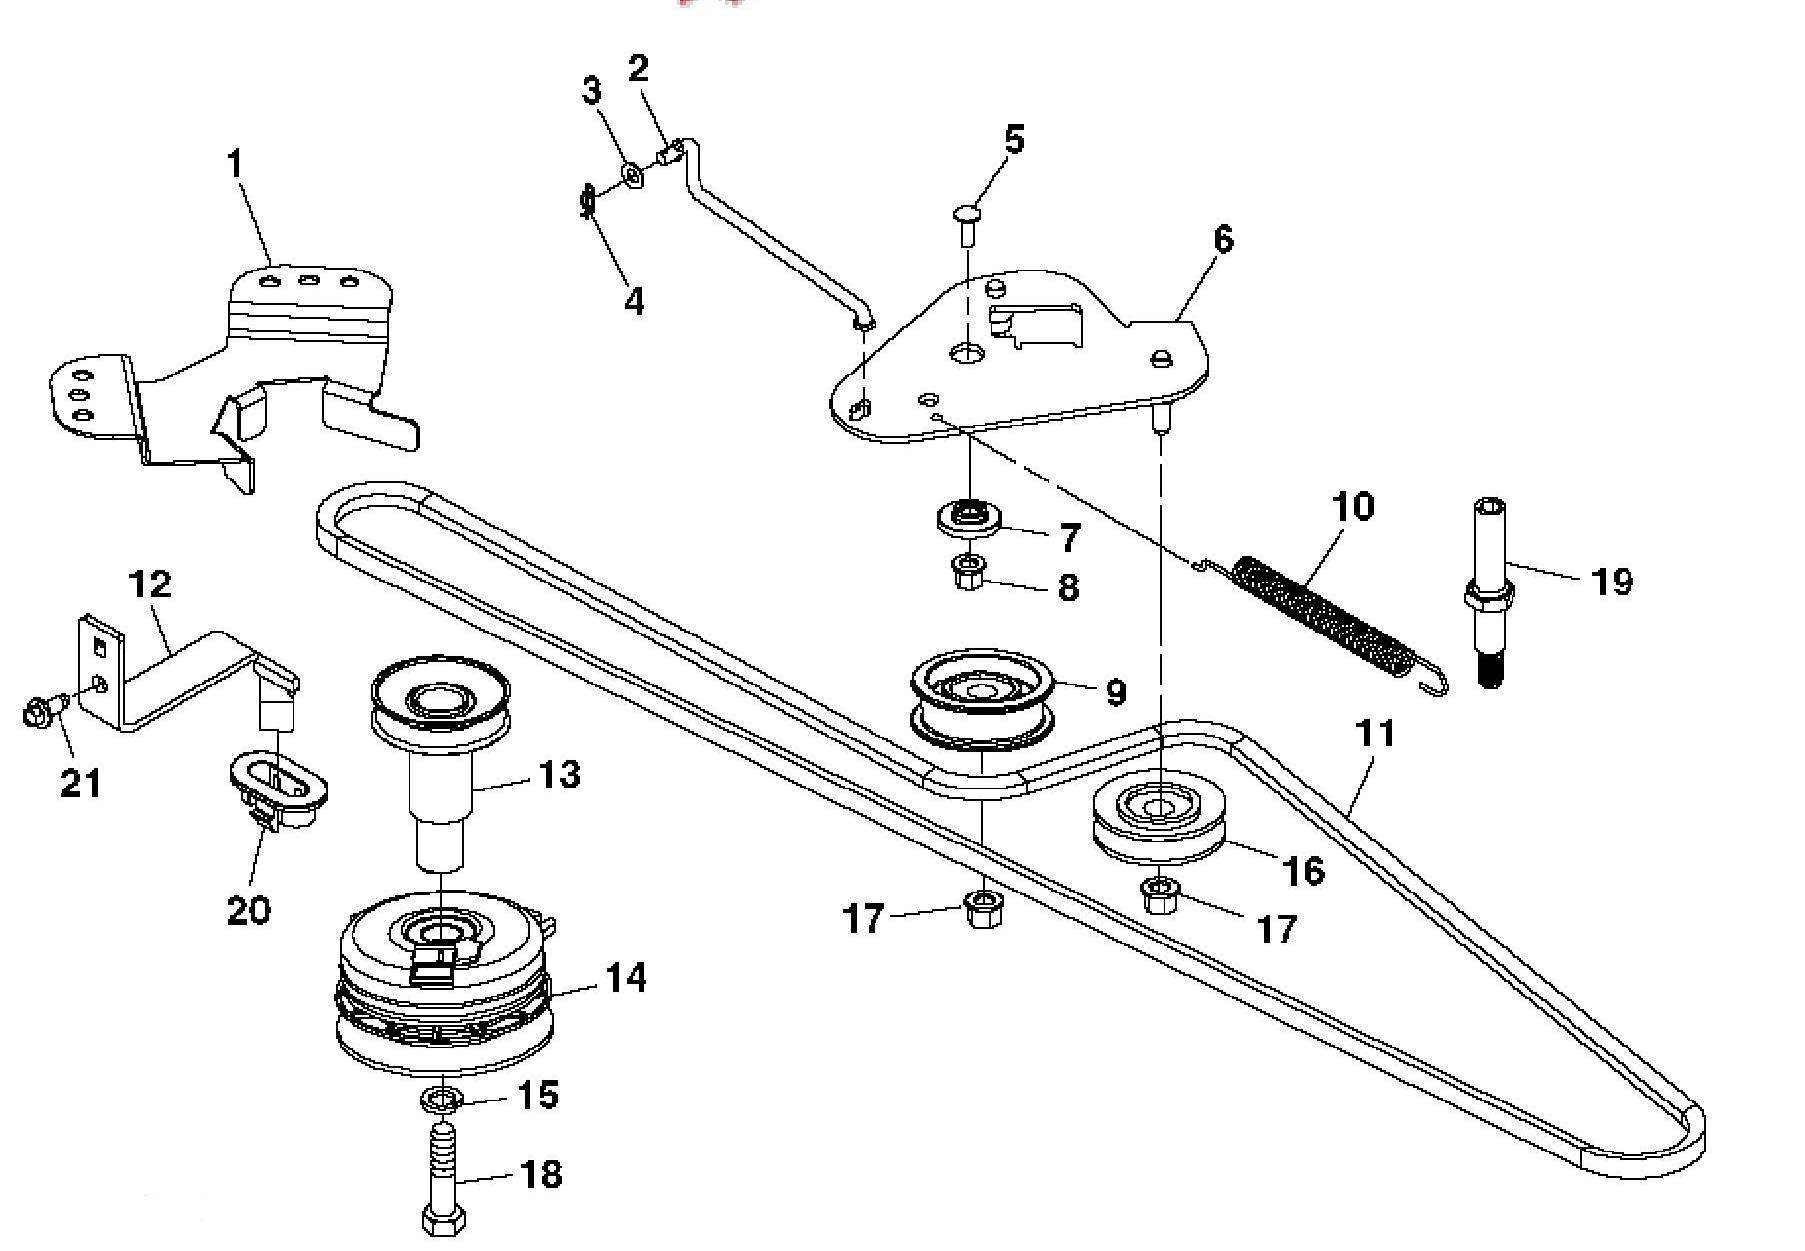 Deck Wiring Diagram. Diagrams. Wiring Diagram Images